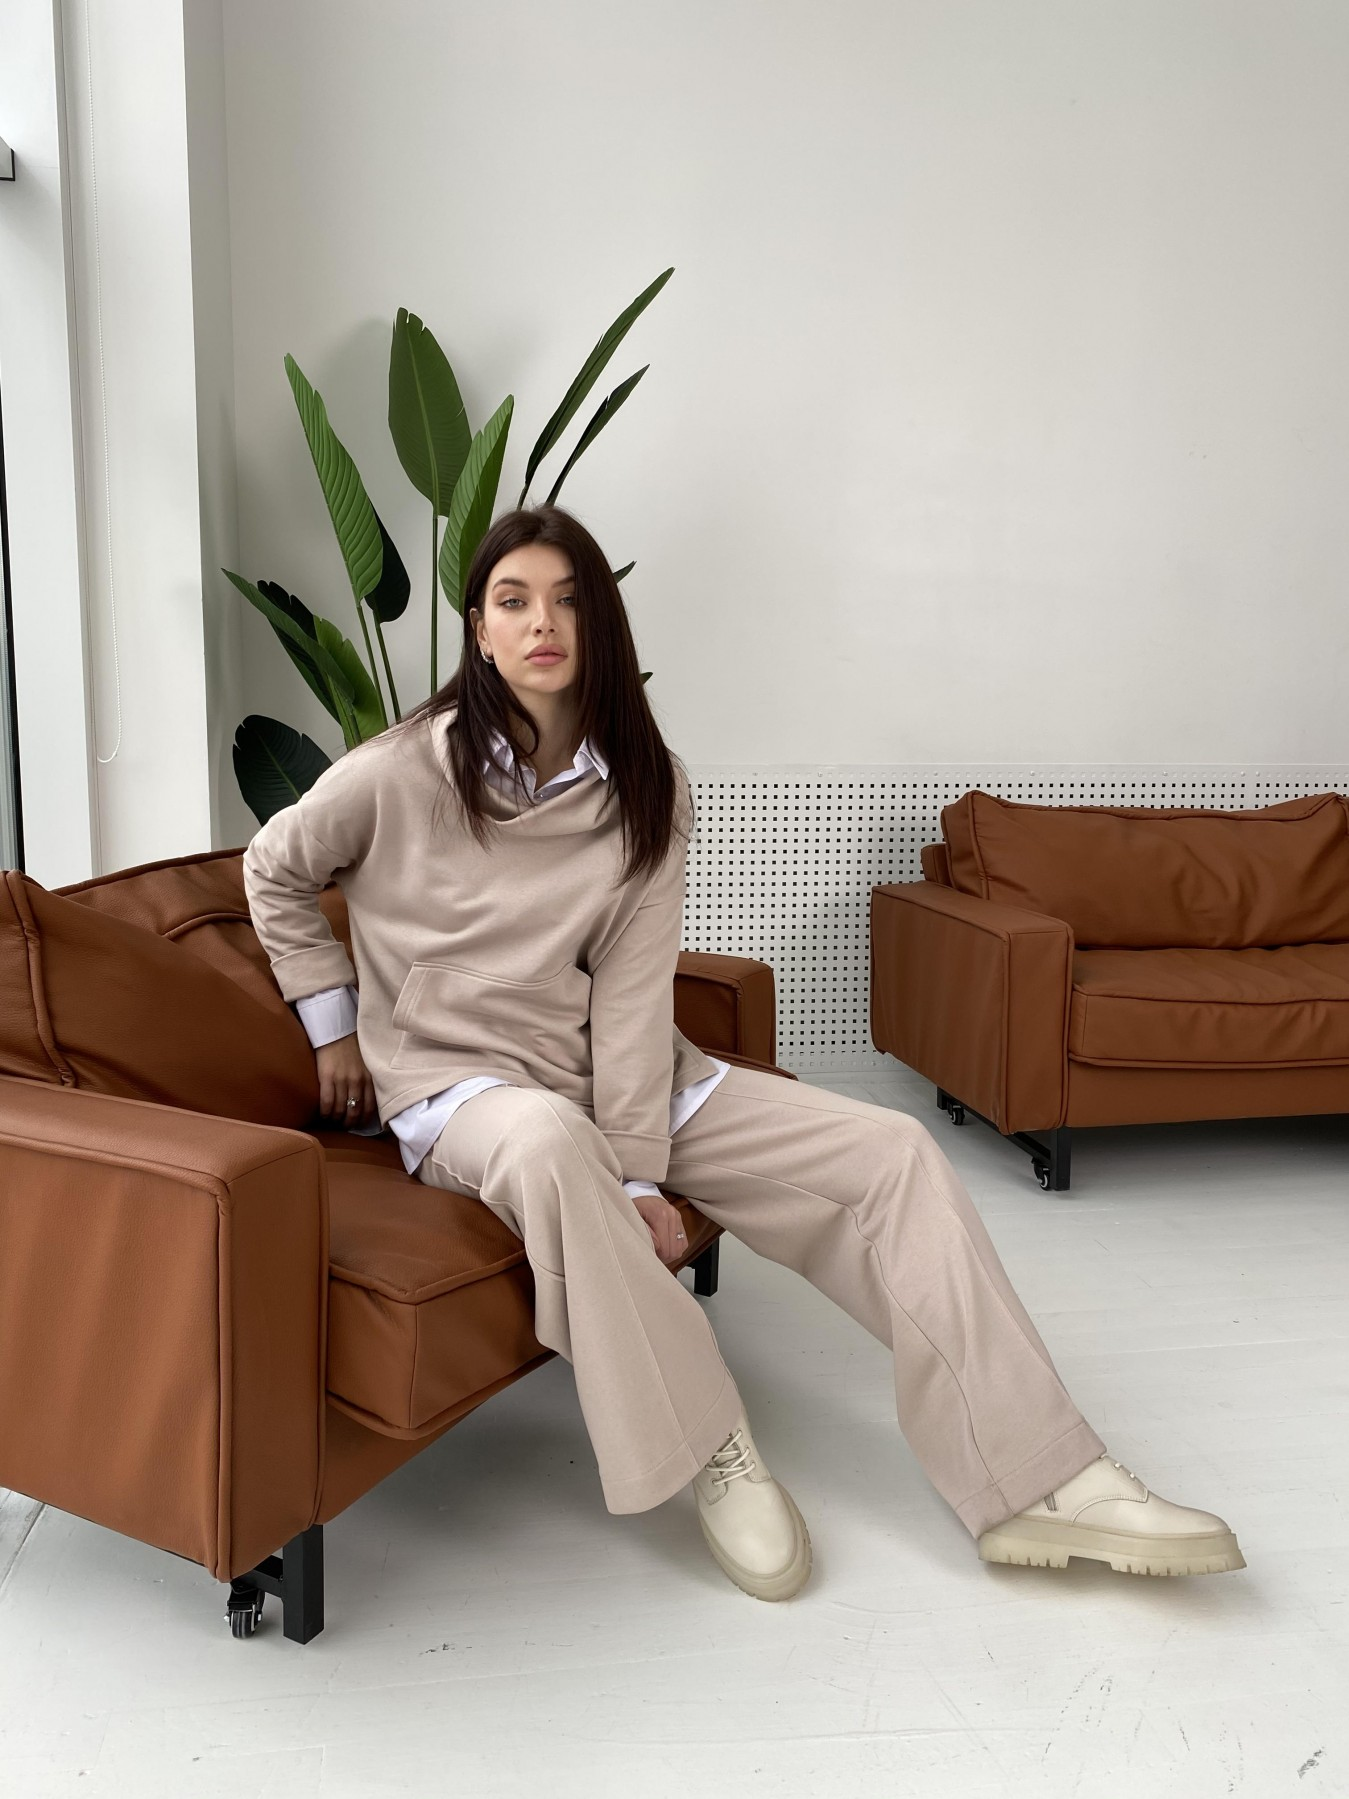 Кристиан костюм 3х нитка 10676 АРТ. 47249 Цвет: Кофе - фото 3, интернет магазин tm-modus.ru